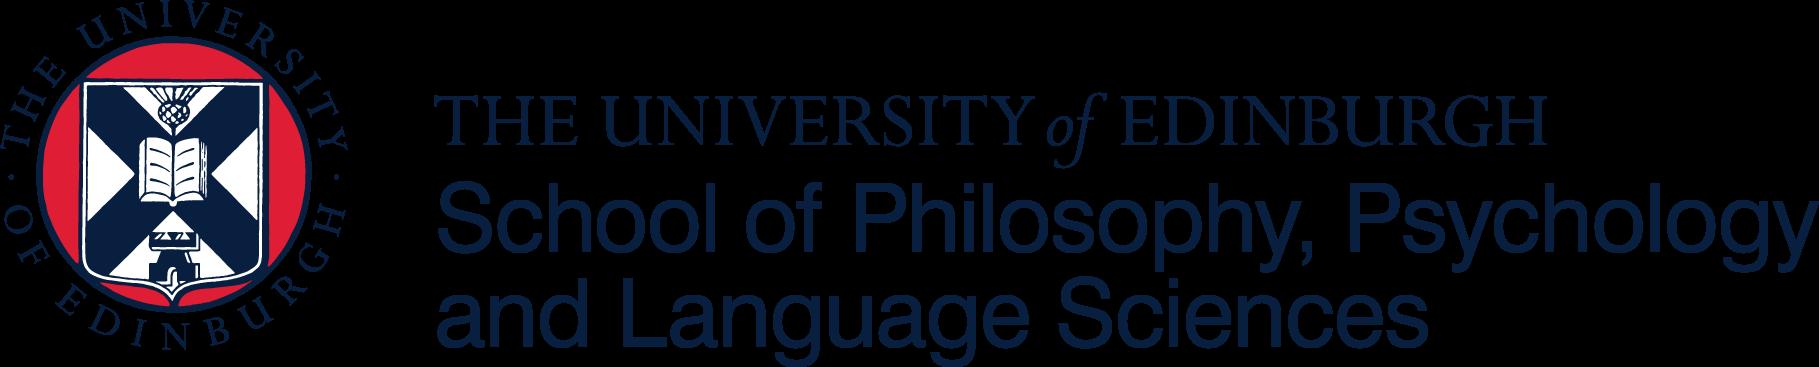 PPLS logo